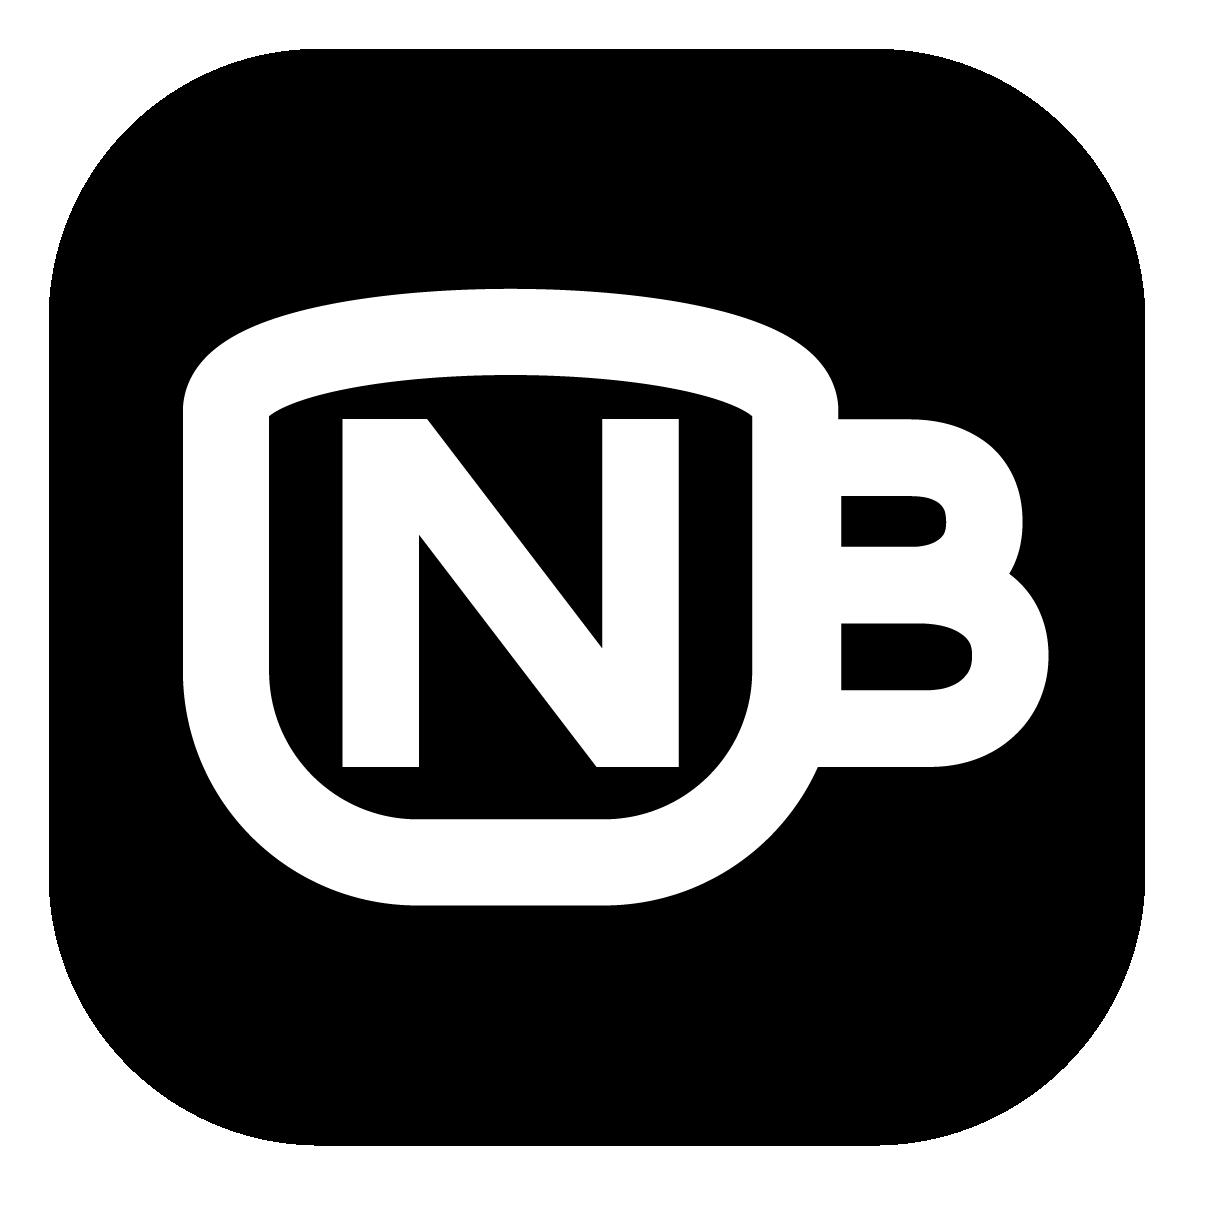 Northern Brews